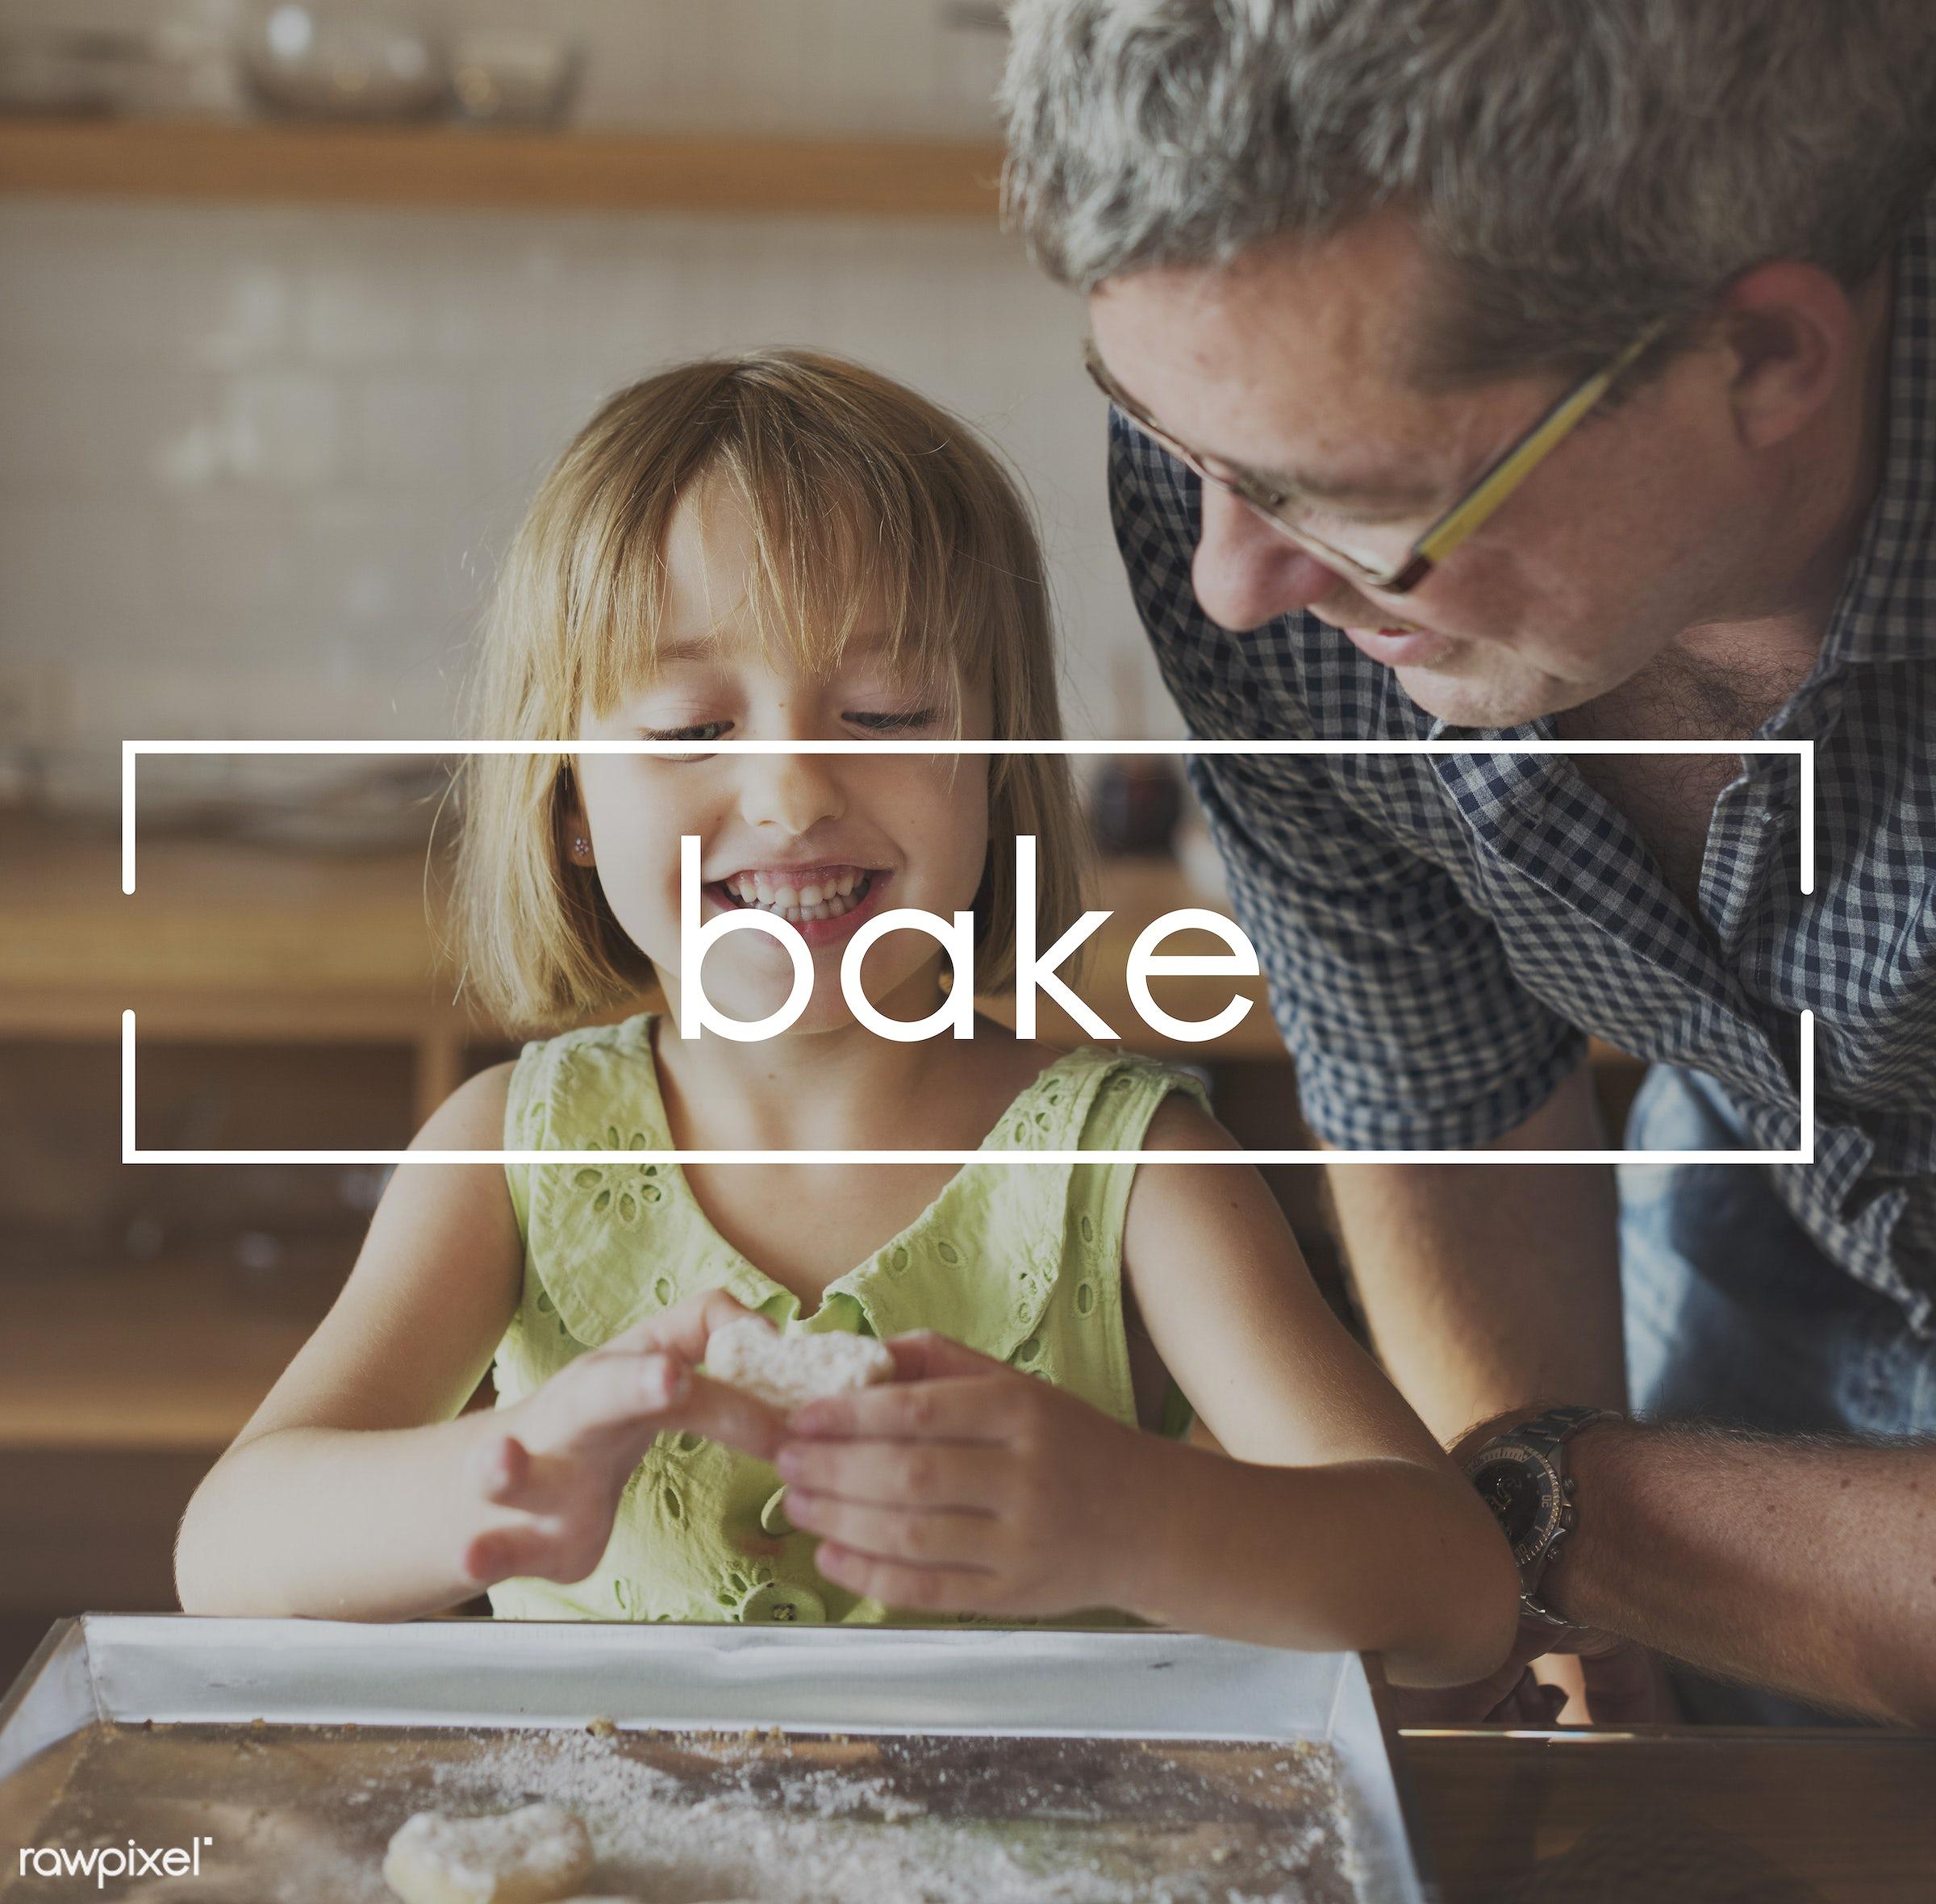 cake, bake, bakery, baking, bonding, cheerful, childhood, cookies, cuisine, culinary, cute, dough, enjoy, enjoyment, family...